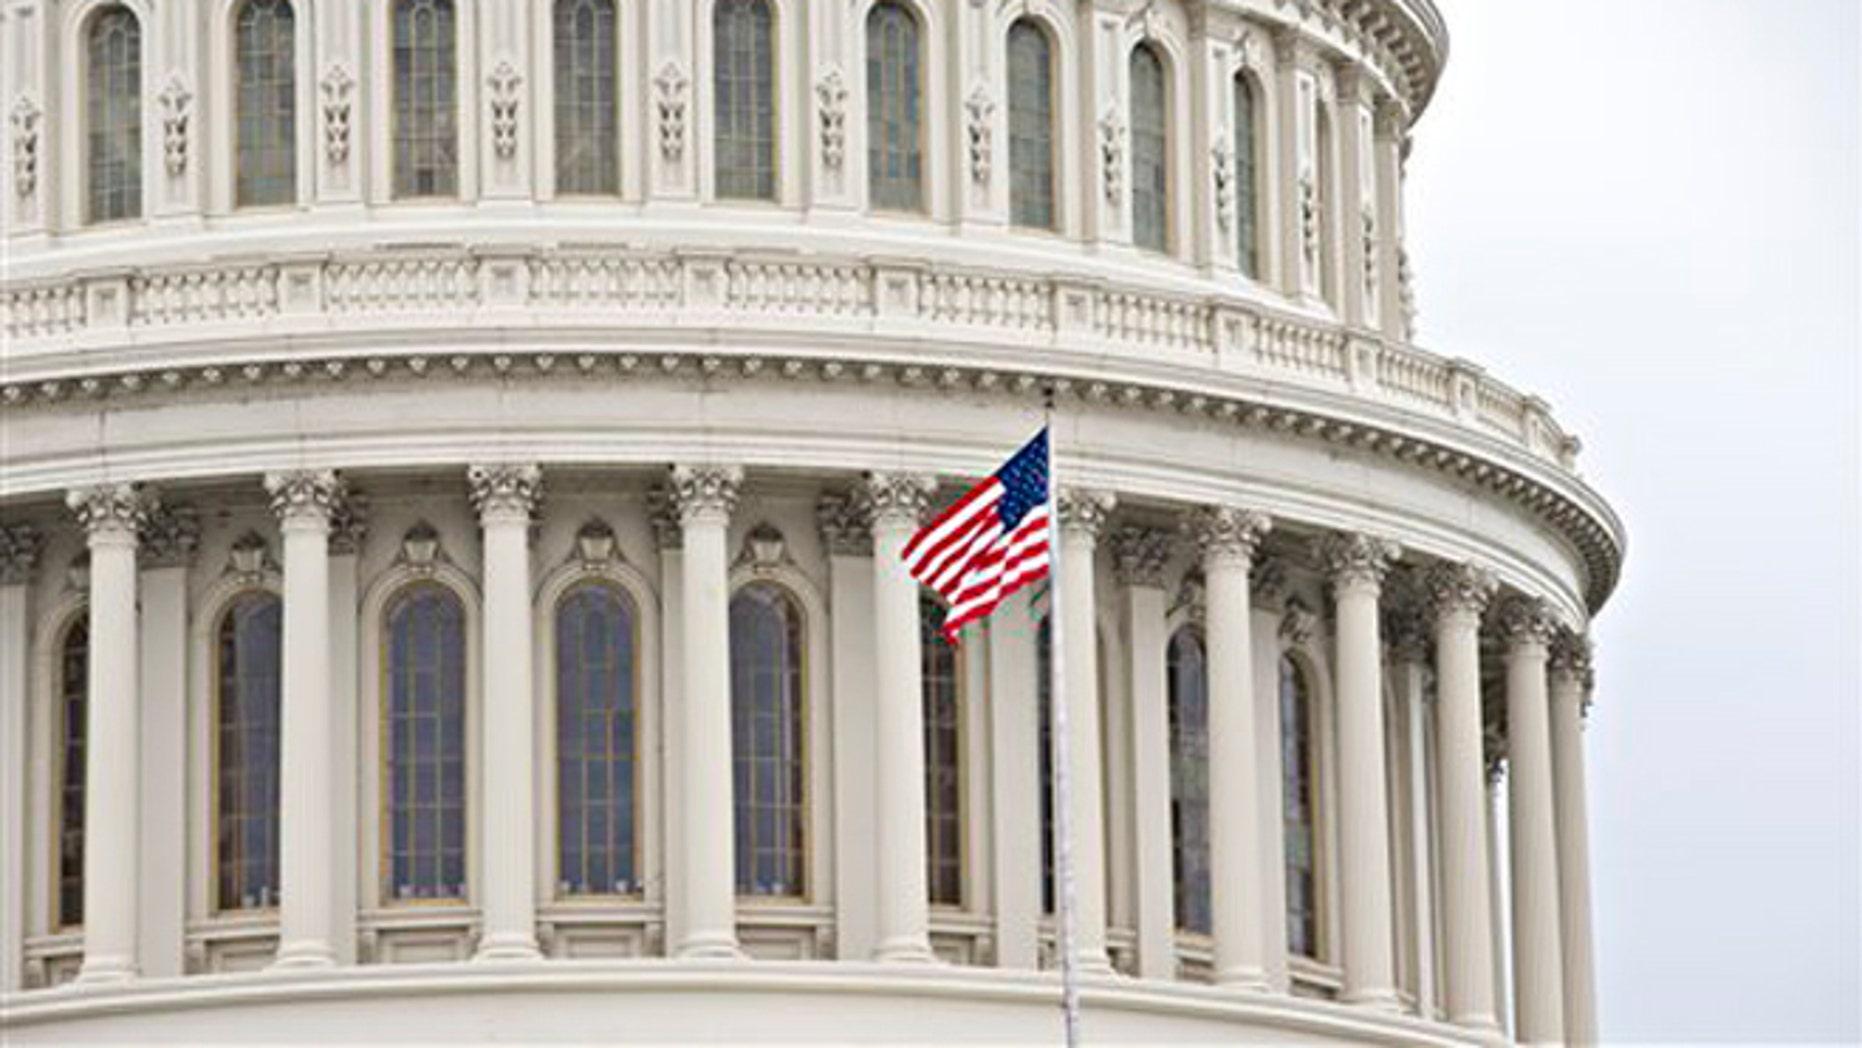 Feb. 26, 2013: The Capitol dome in Washington